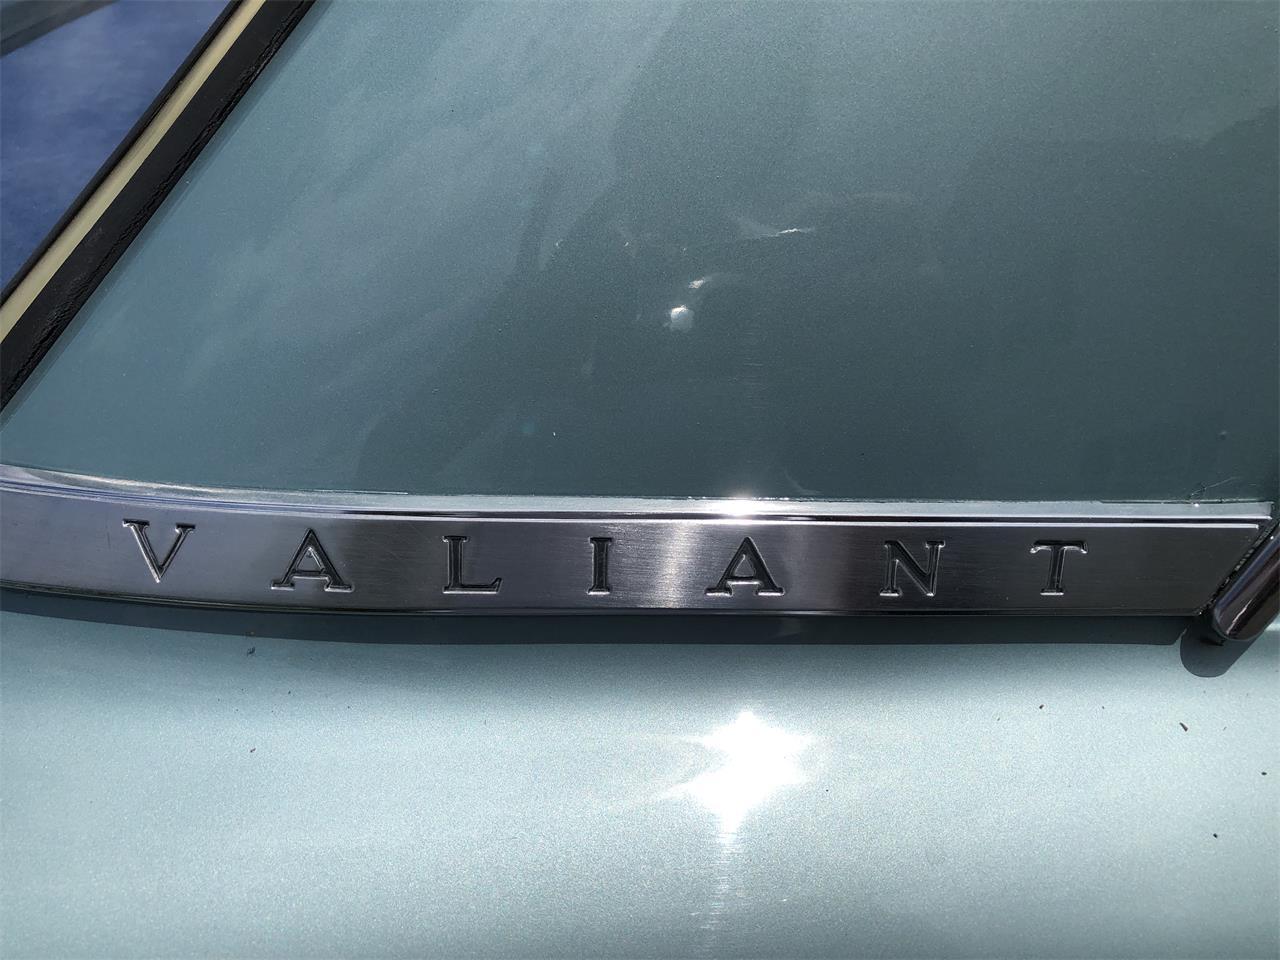 1964 Plymouth Valiant (CC-1239295) for sale in Edinburg, Virginia